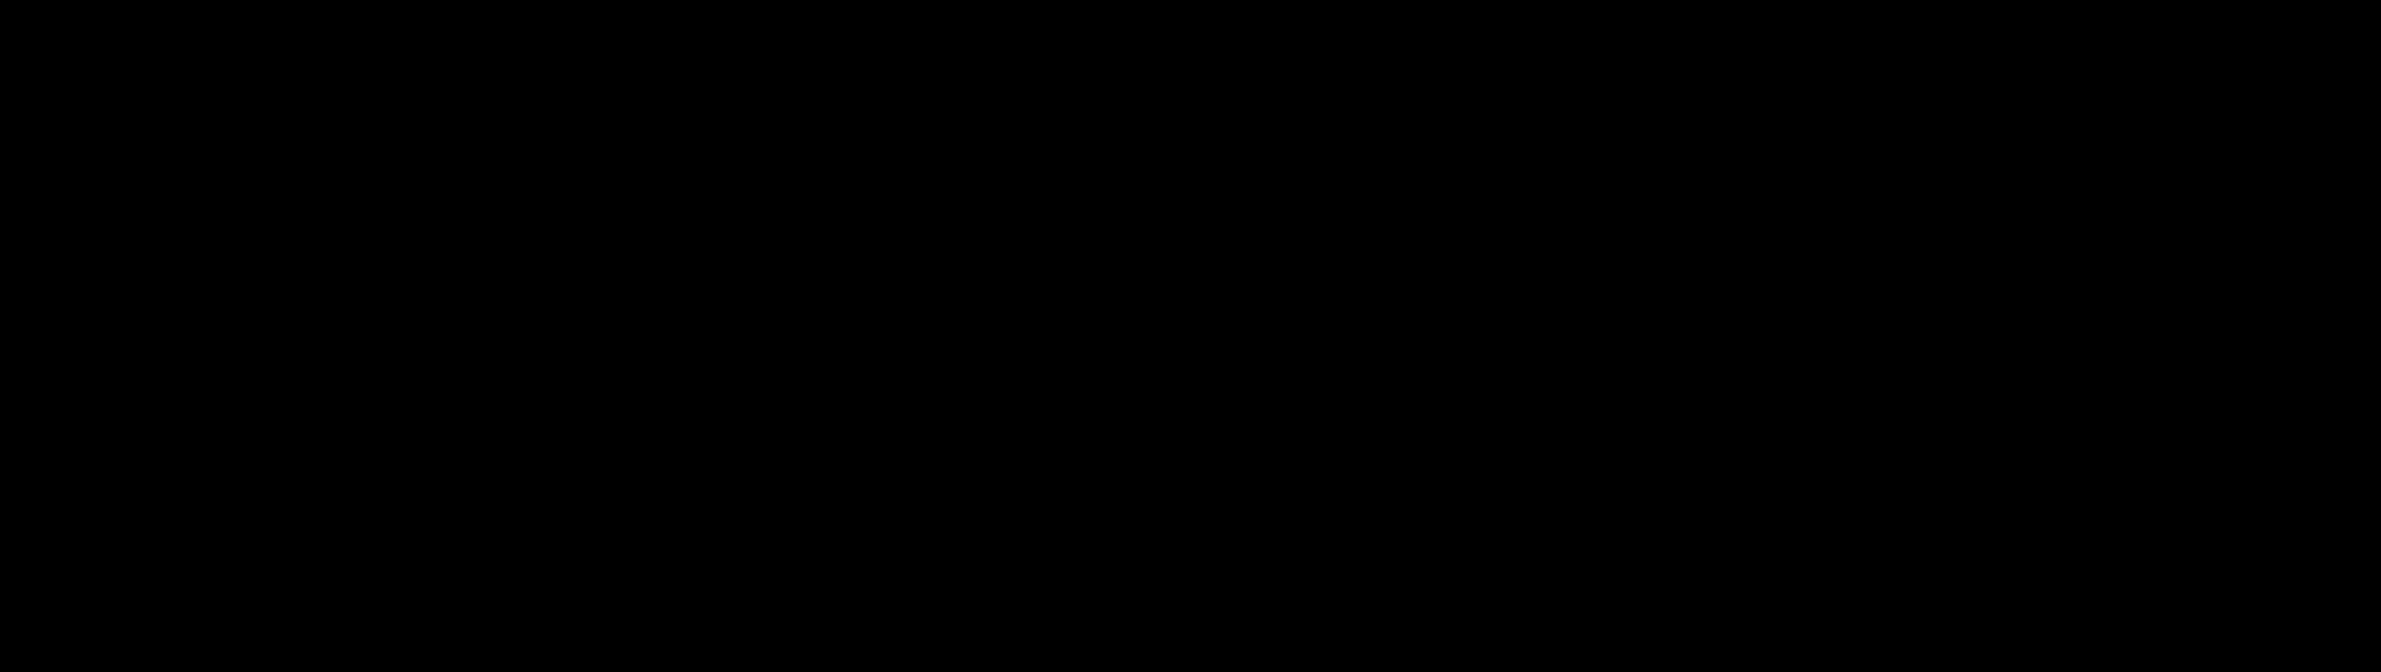 YB Scribble Logo-01